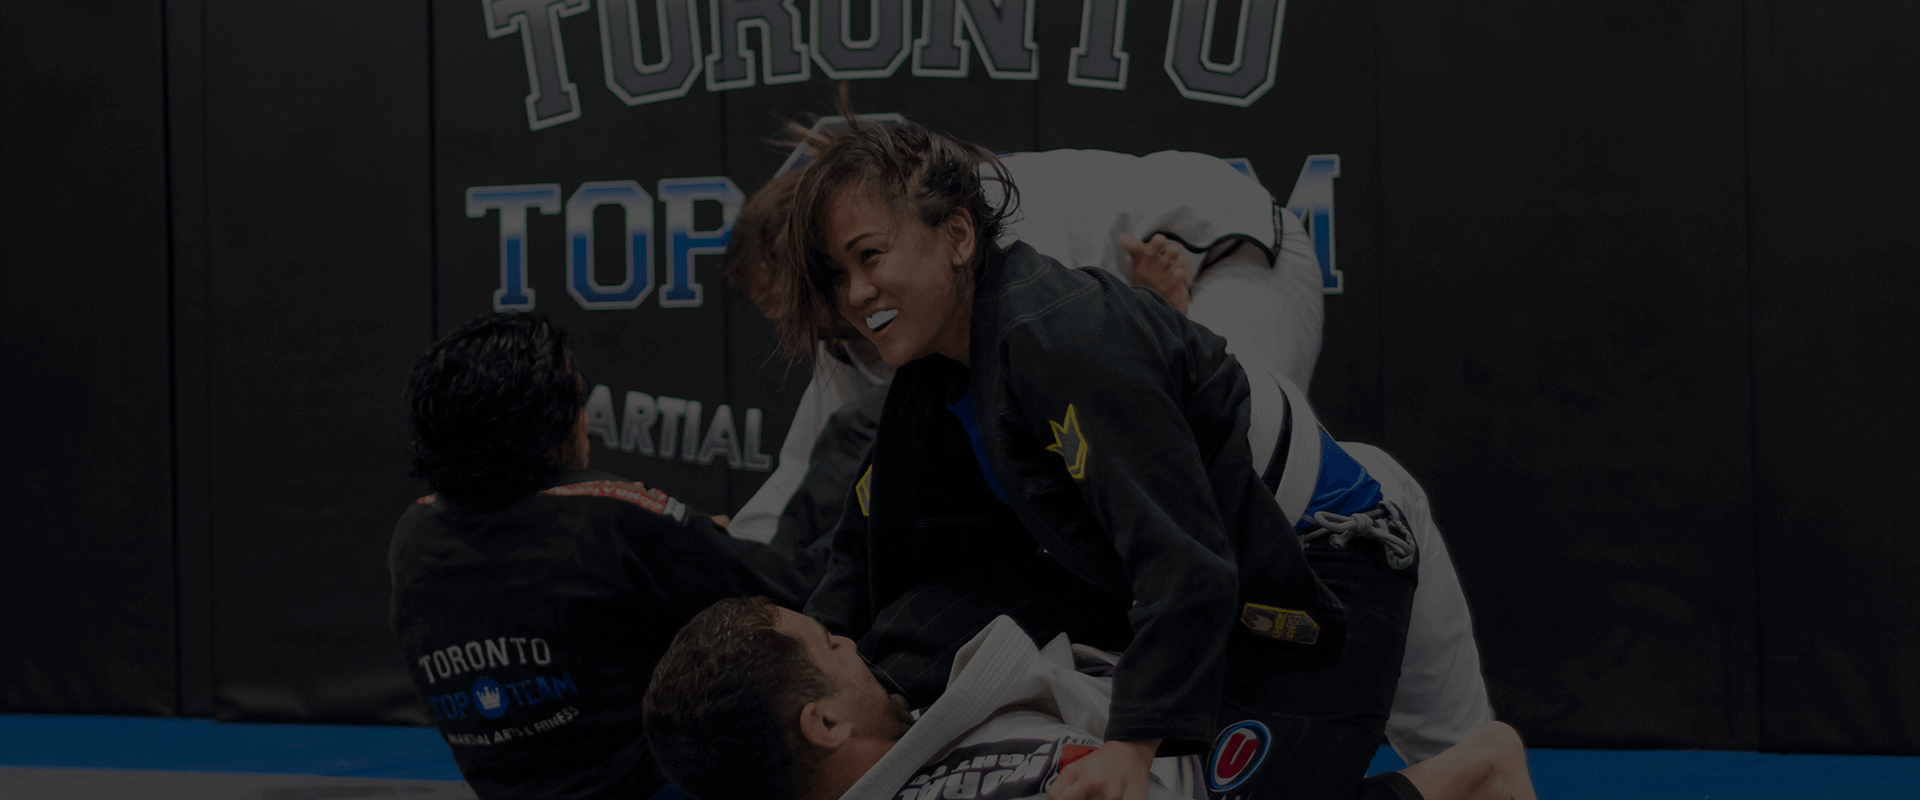 Toronto Top Team Martial Arts Fitness Scarborough Mma Martial Arts